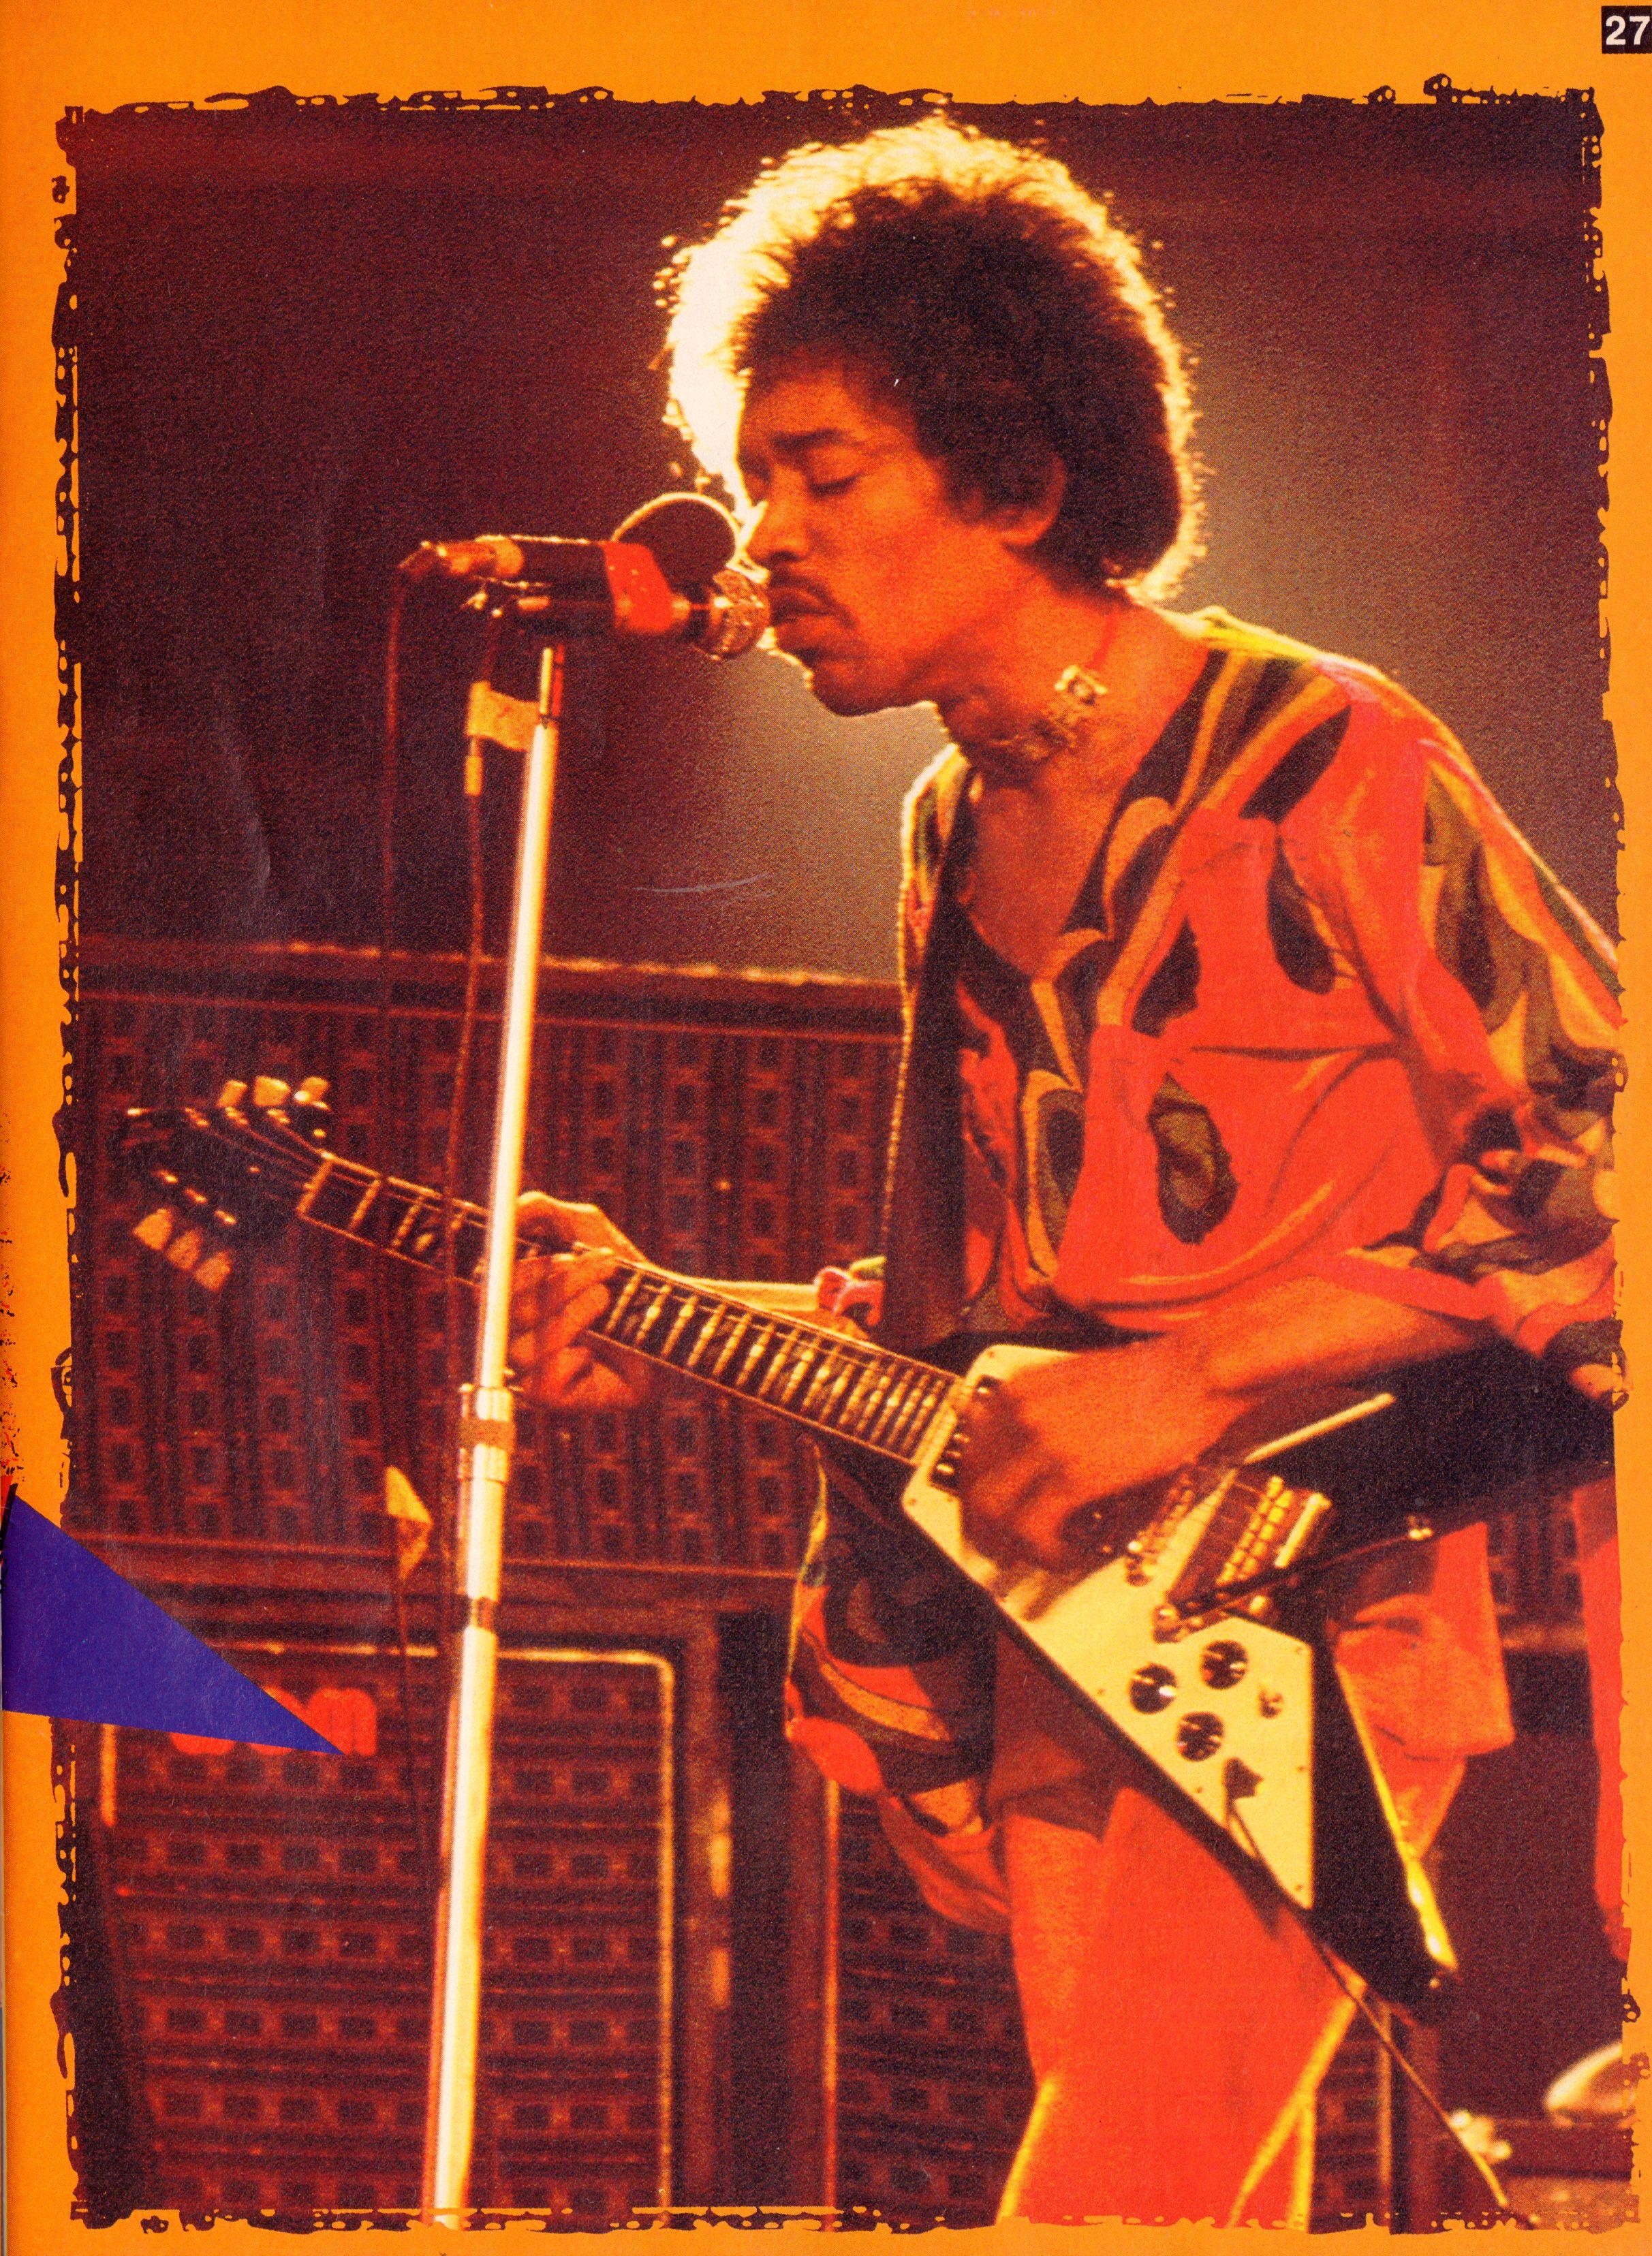 Magazines Français 1989 - 2014 GuitaristMai1995Page27